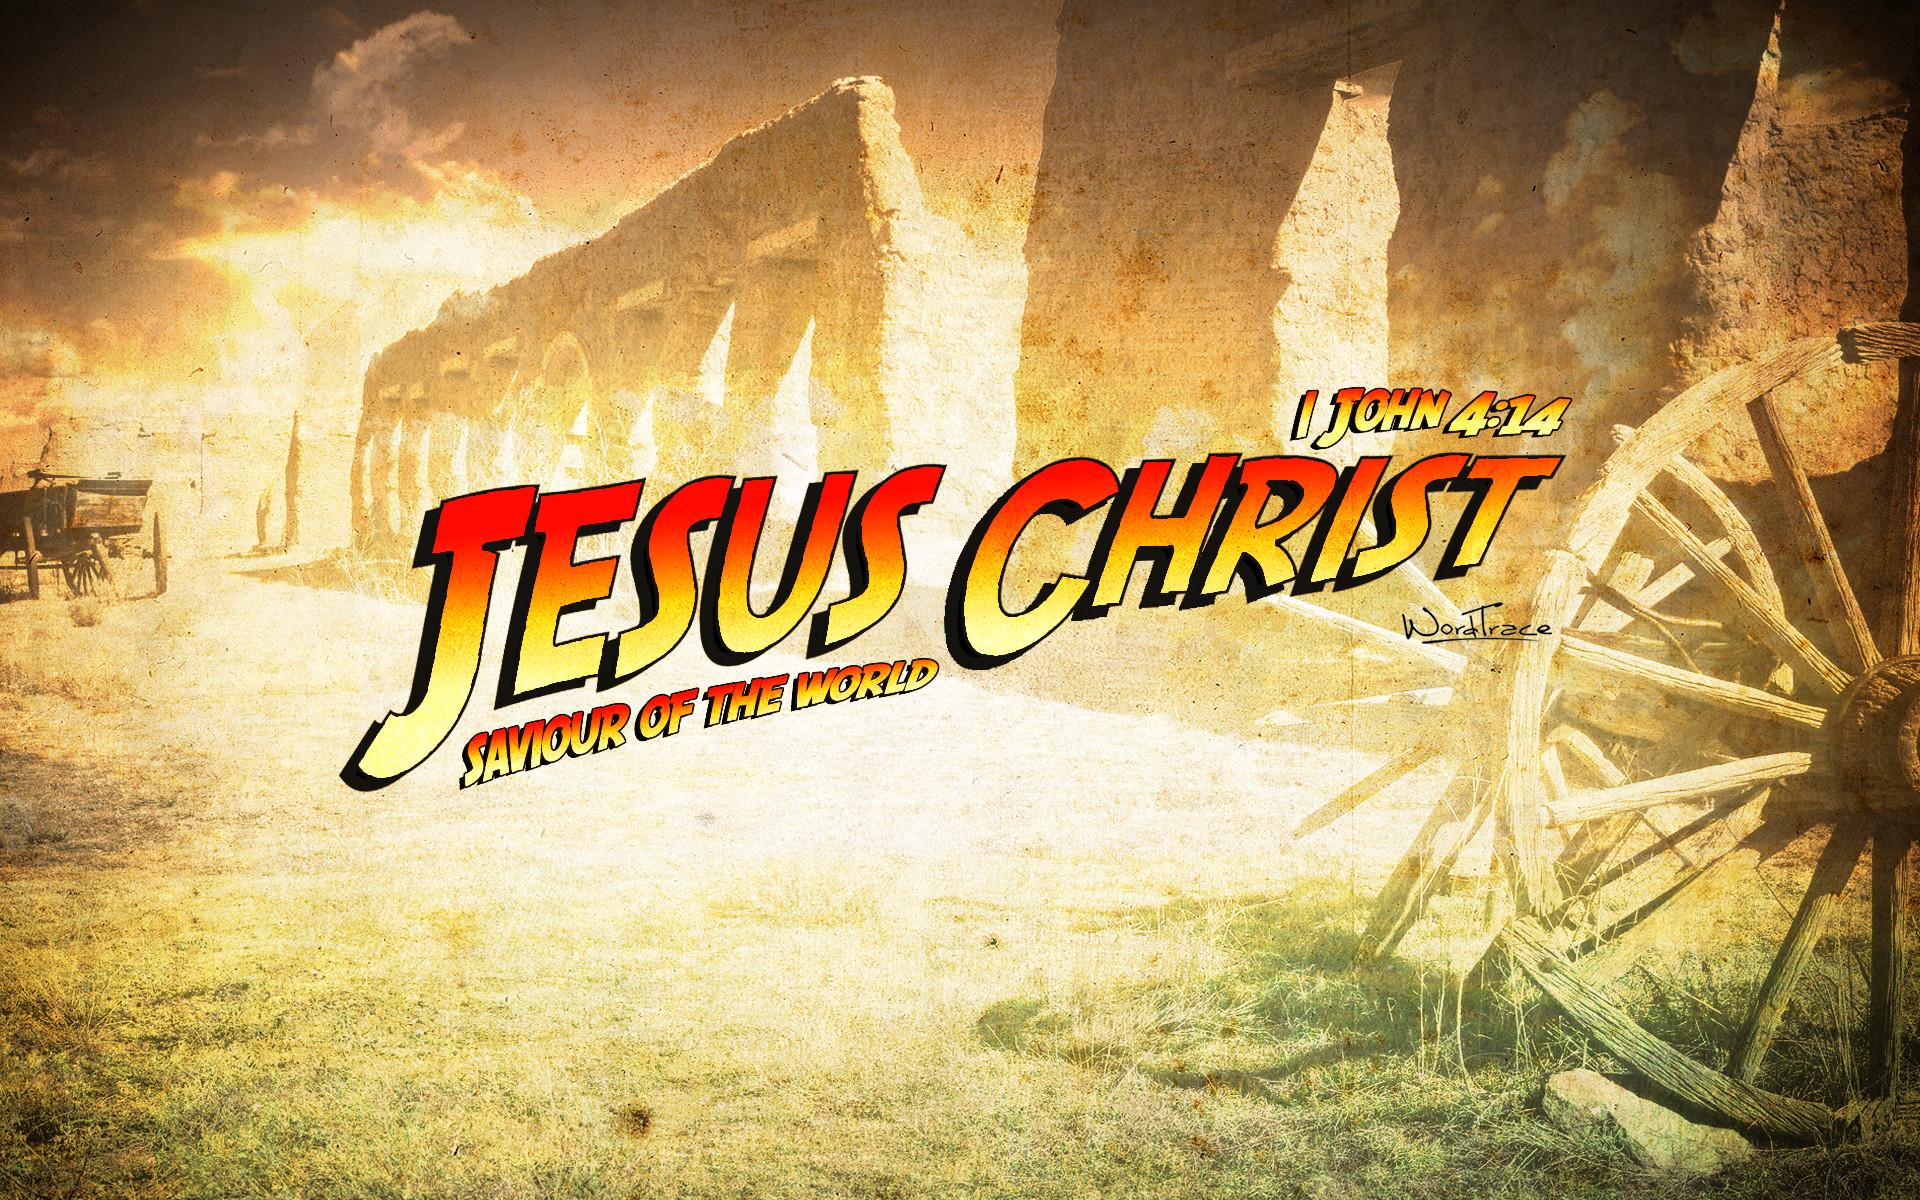 Jesus Christ (Indiana Jones Style)